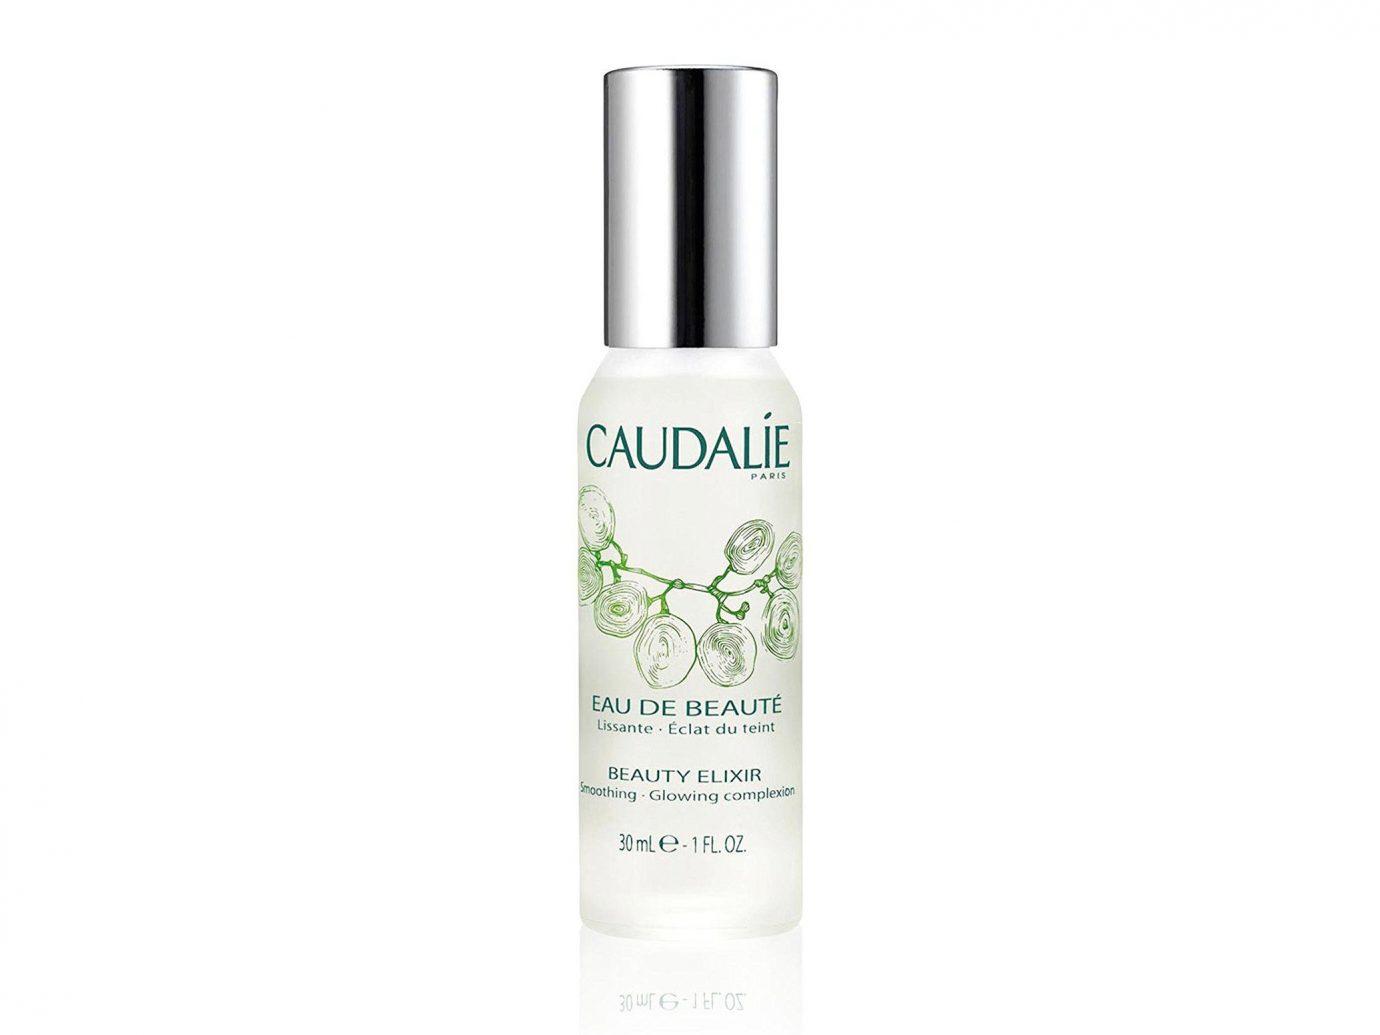 Beauty Health + Wellness Travel Shop toiletry product skin care lotion liquid health & beauty cosmetics